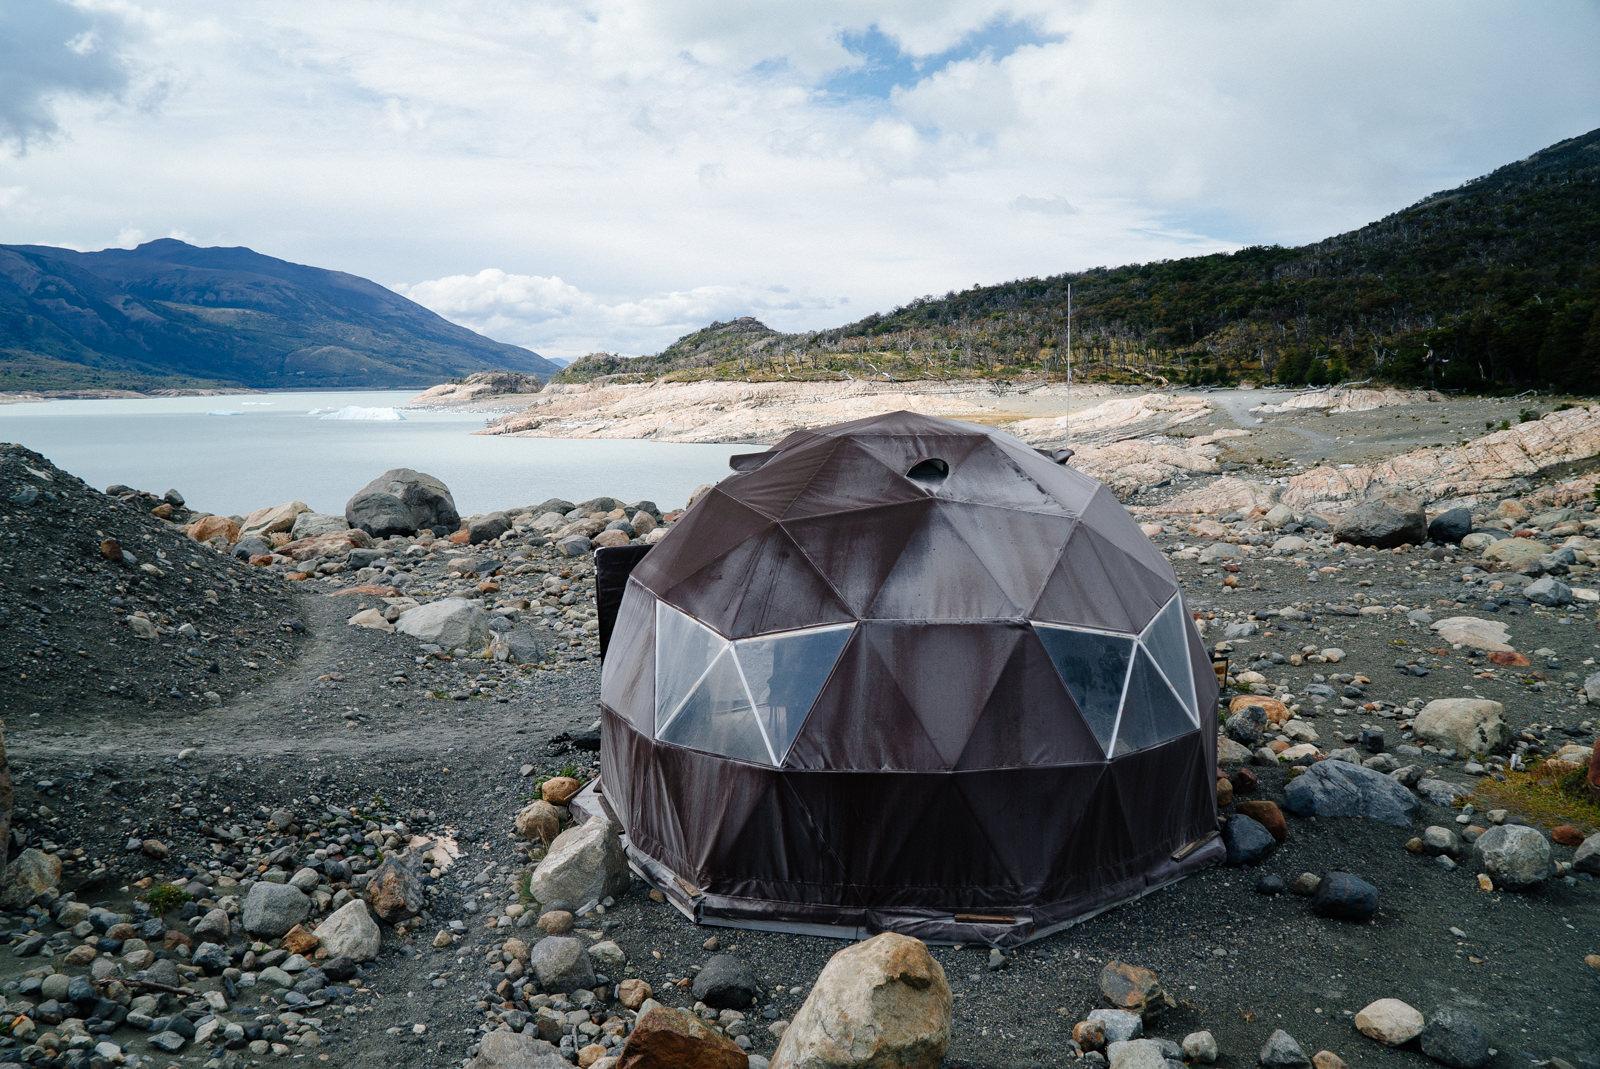 wrenee-perito-moreno-glacier-trekking-patagonia-argentina-2.jpg